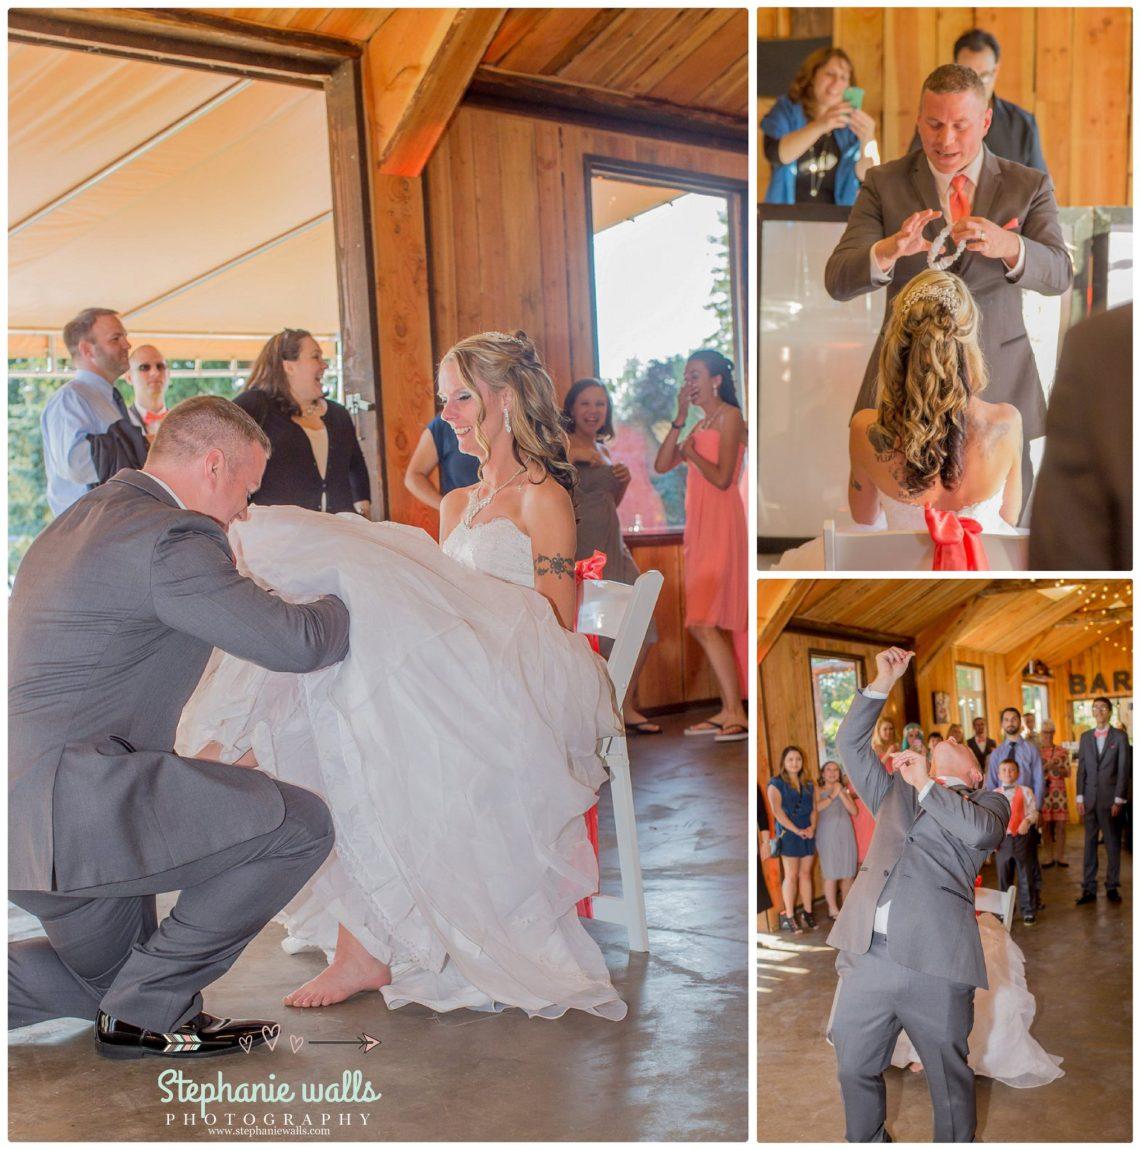 Baker Wedding 21 1 Blending Beats Together   Olympic View Estates Snohomish WA